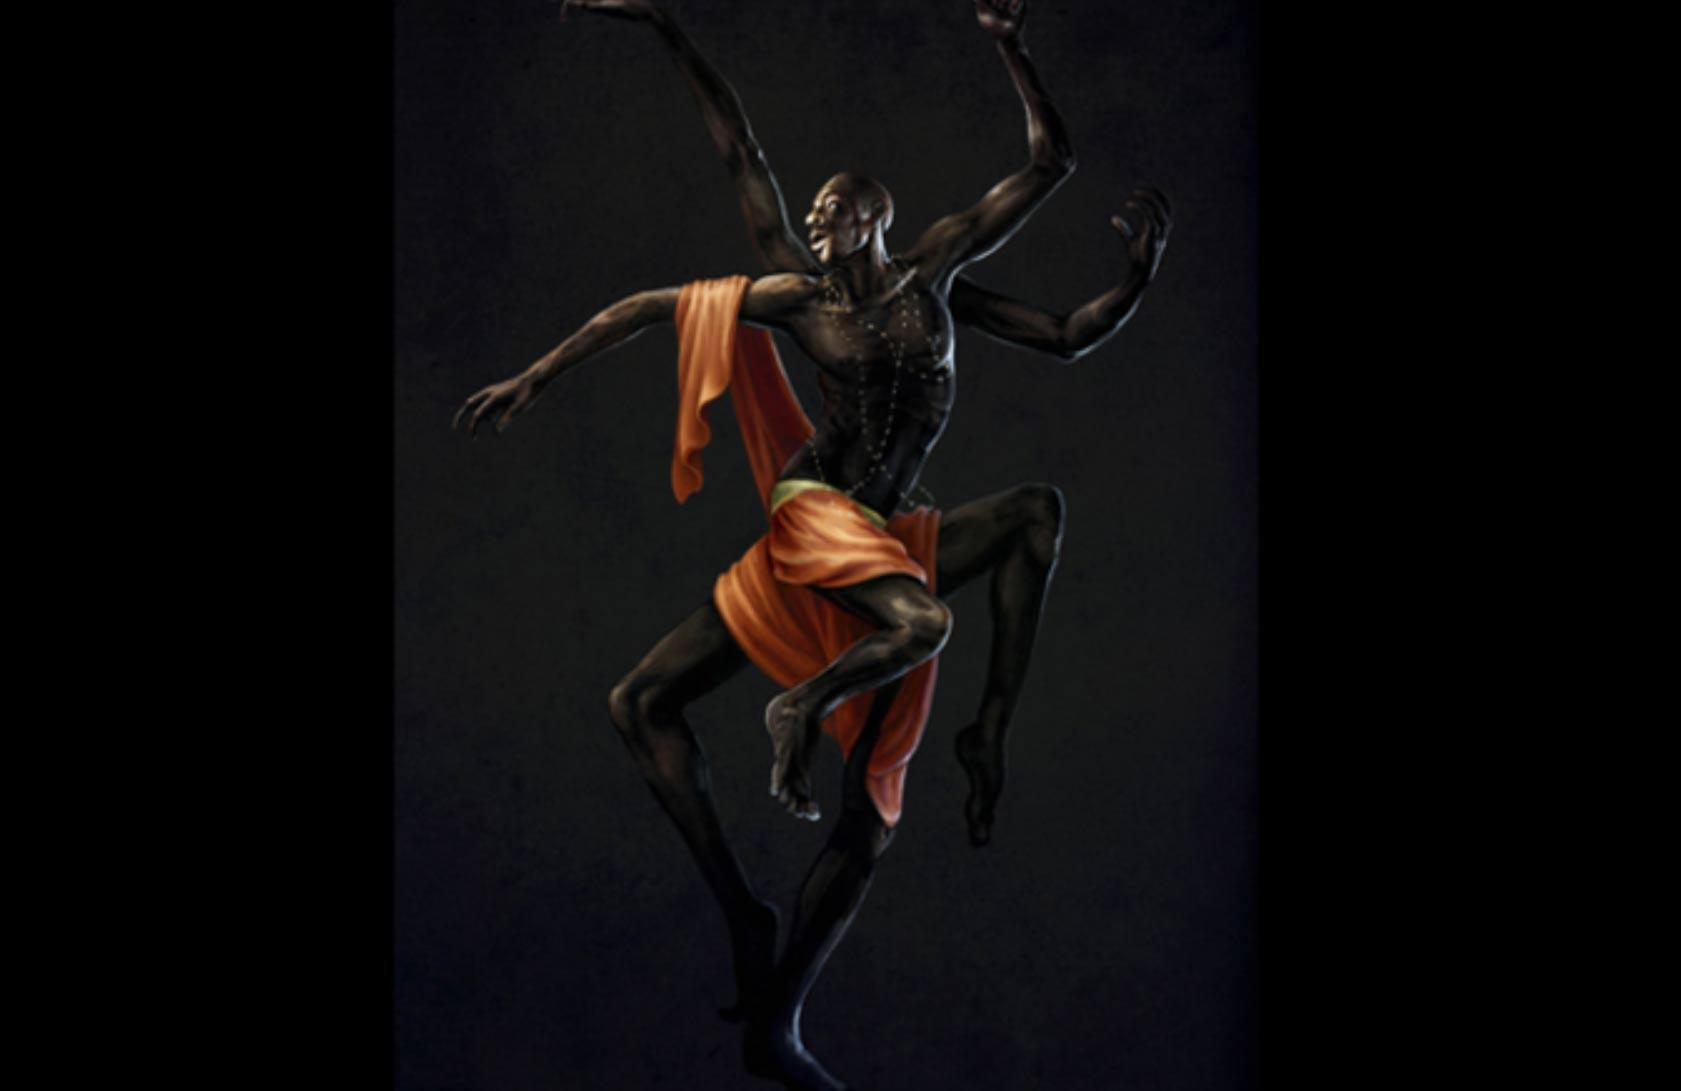 Anansi – Deity or Storybook Trickster? | Ancient Origins